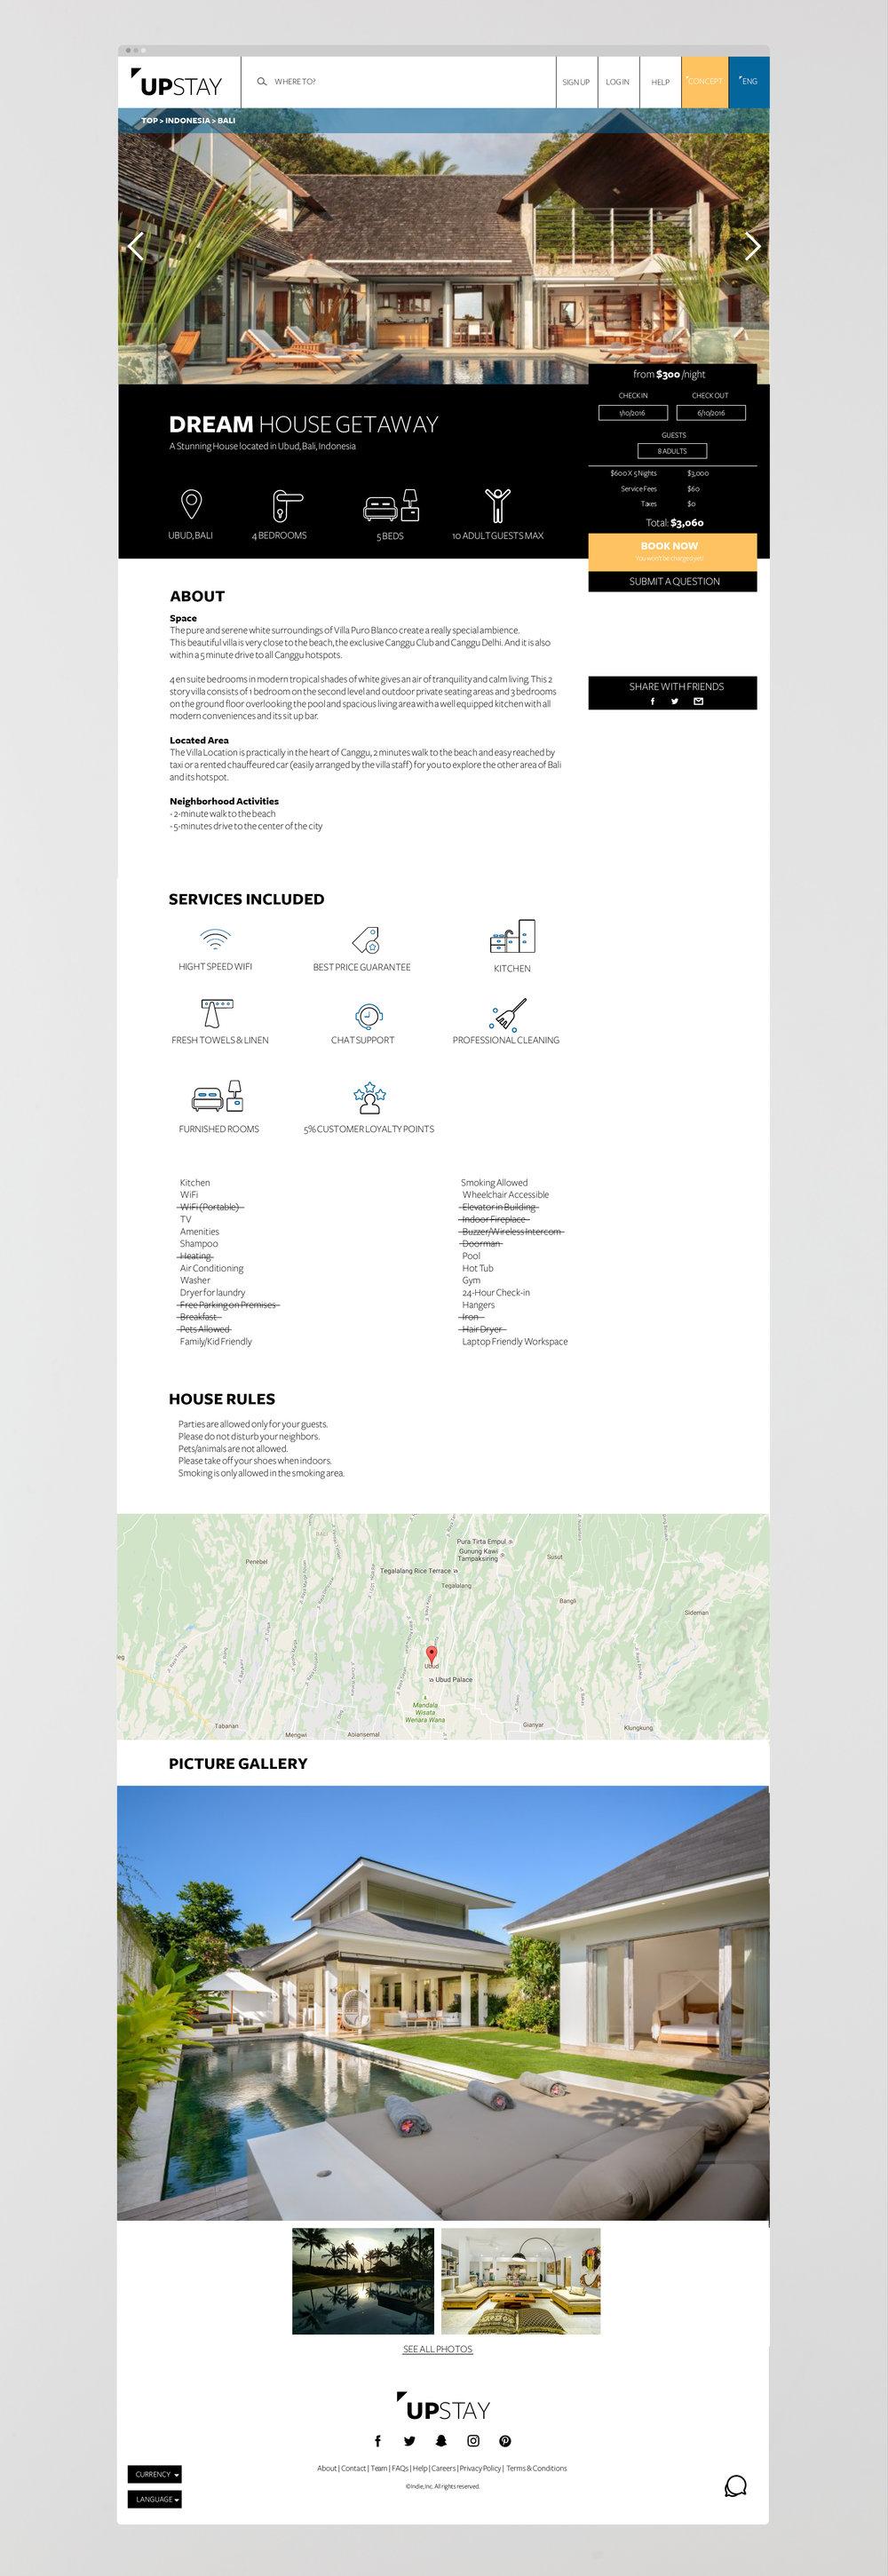 upstay_page-1-2.jpg